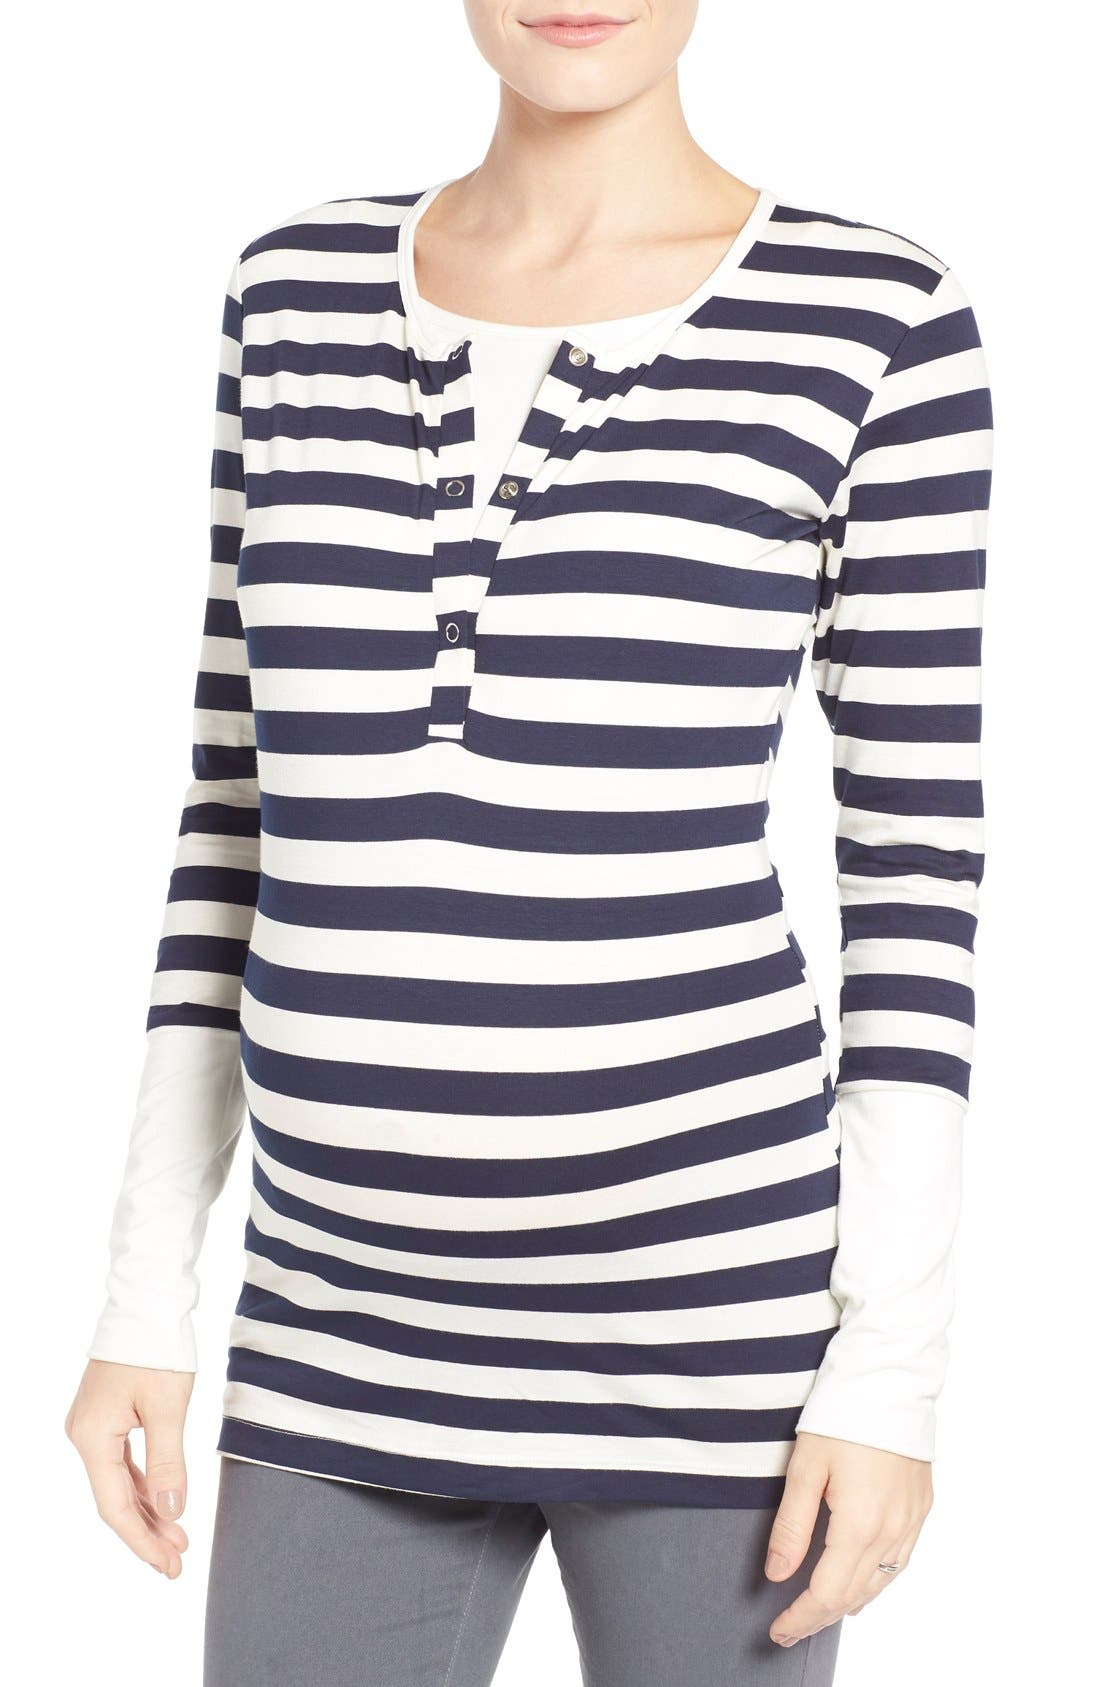 'Jenn' Nursing Top,                             Main thumbnail 1, color,                             Navy Stripe With Cream Cuff